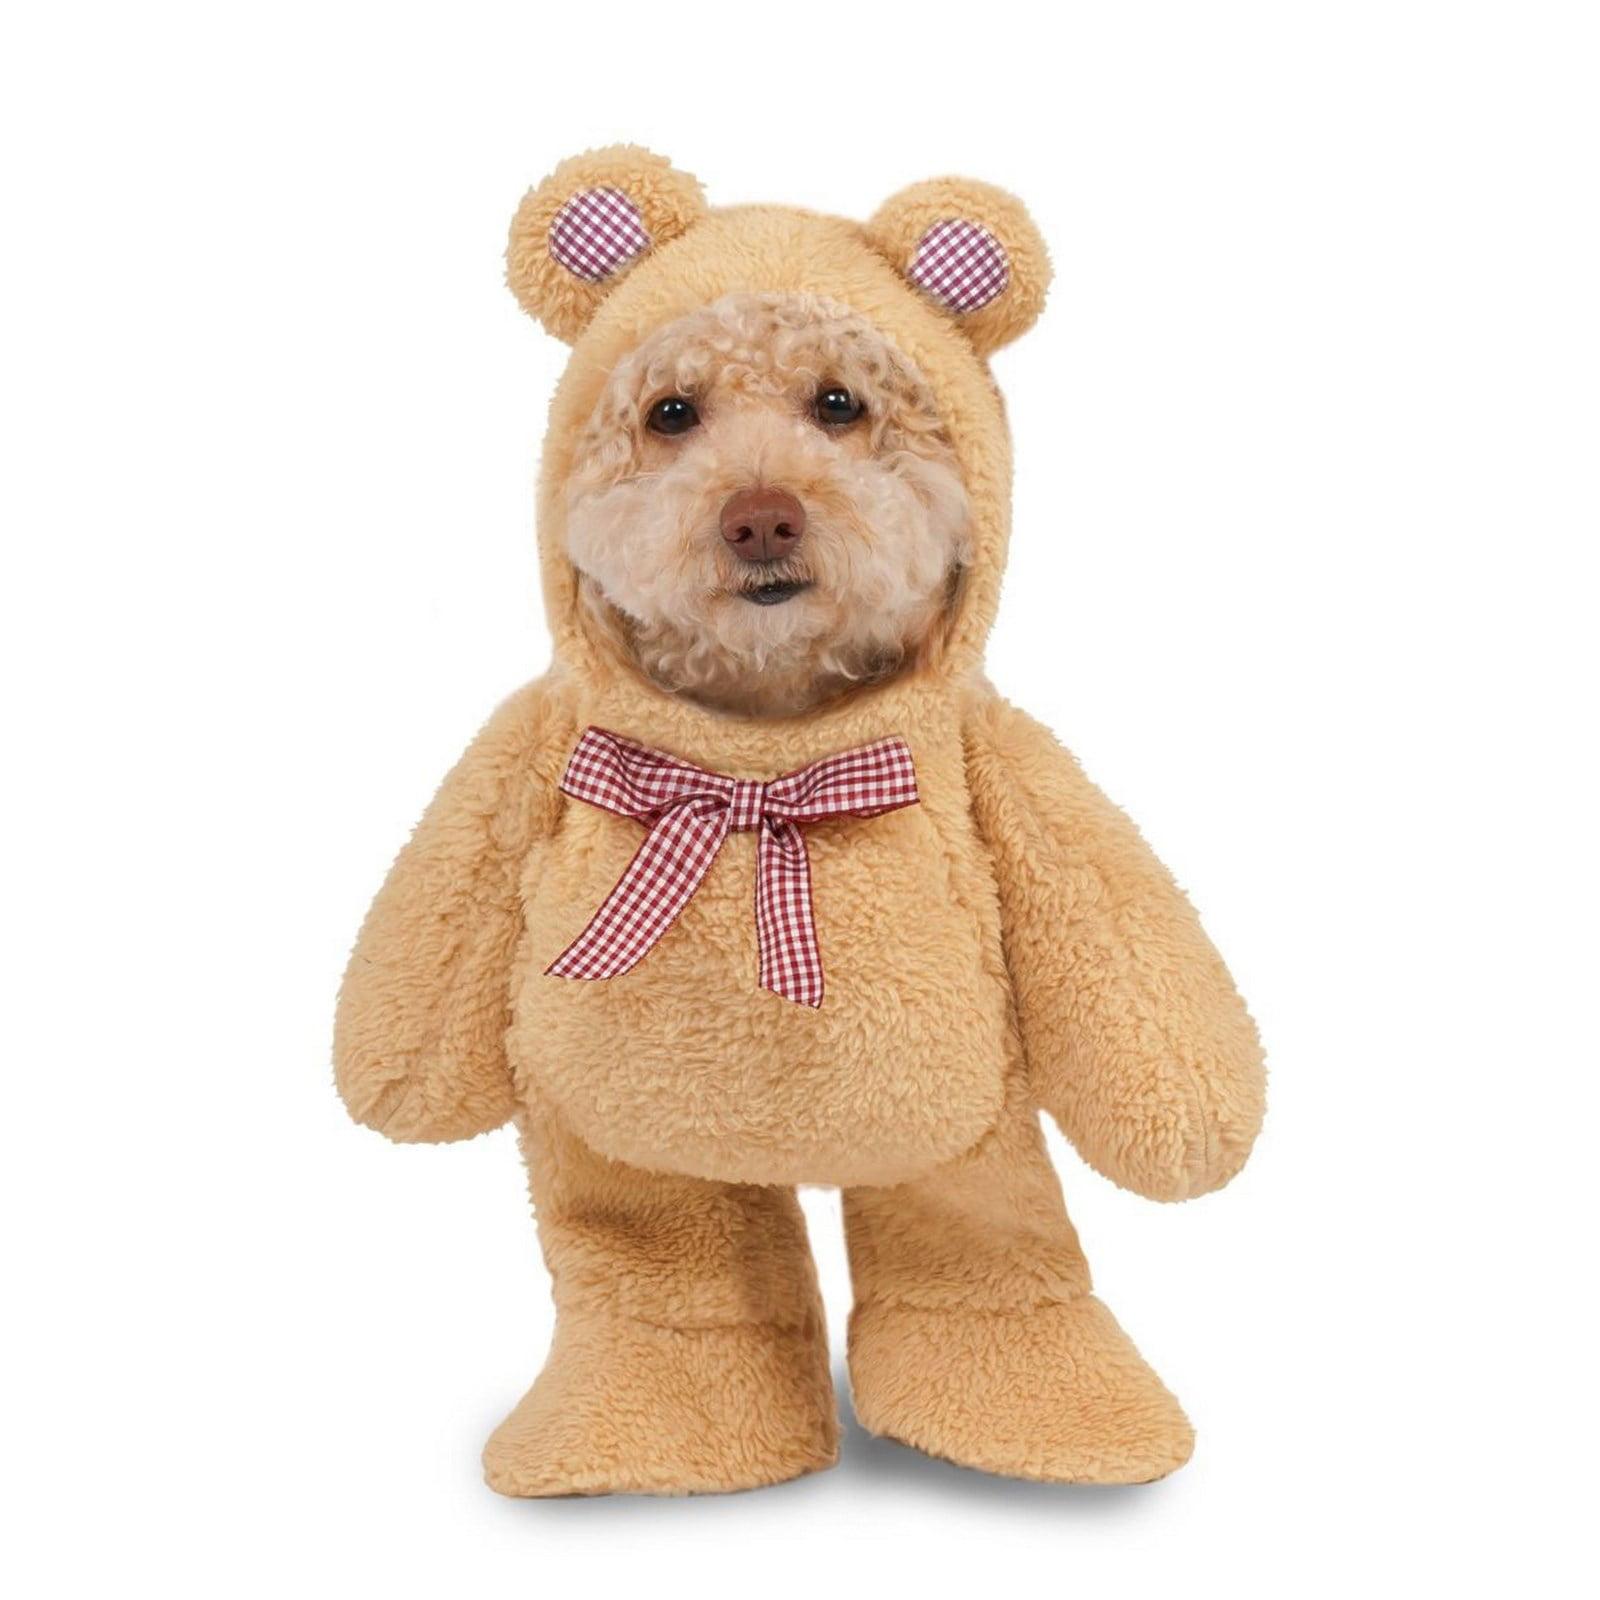 Halloween Walking Teddy Bear Pet Costume